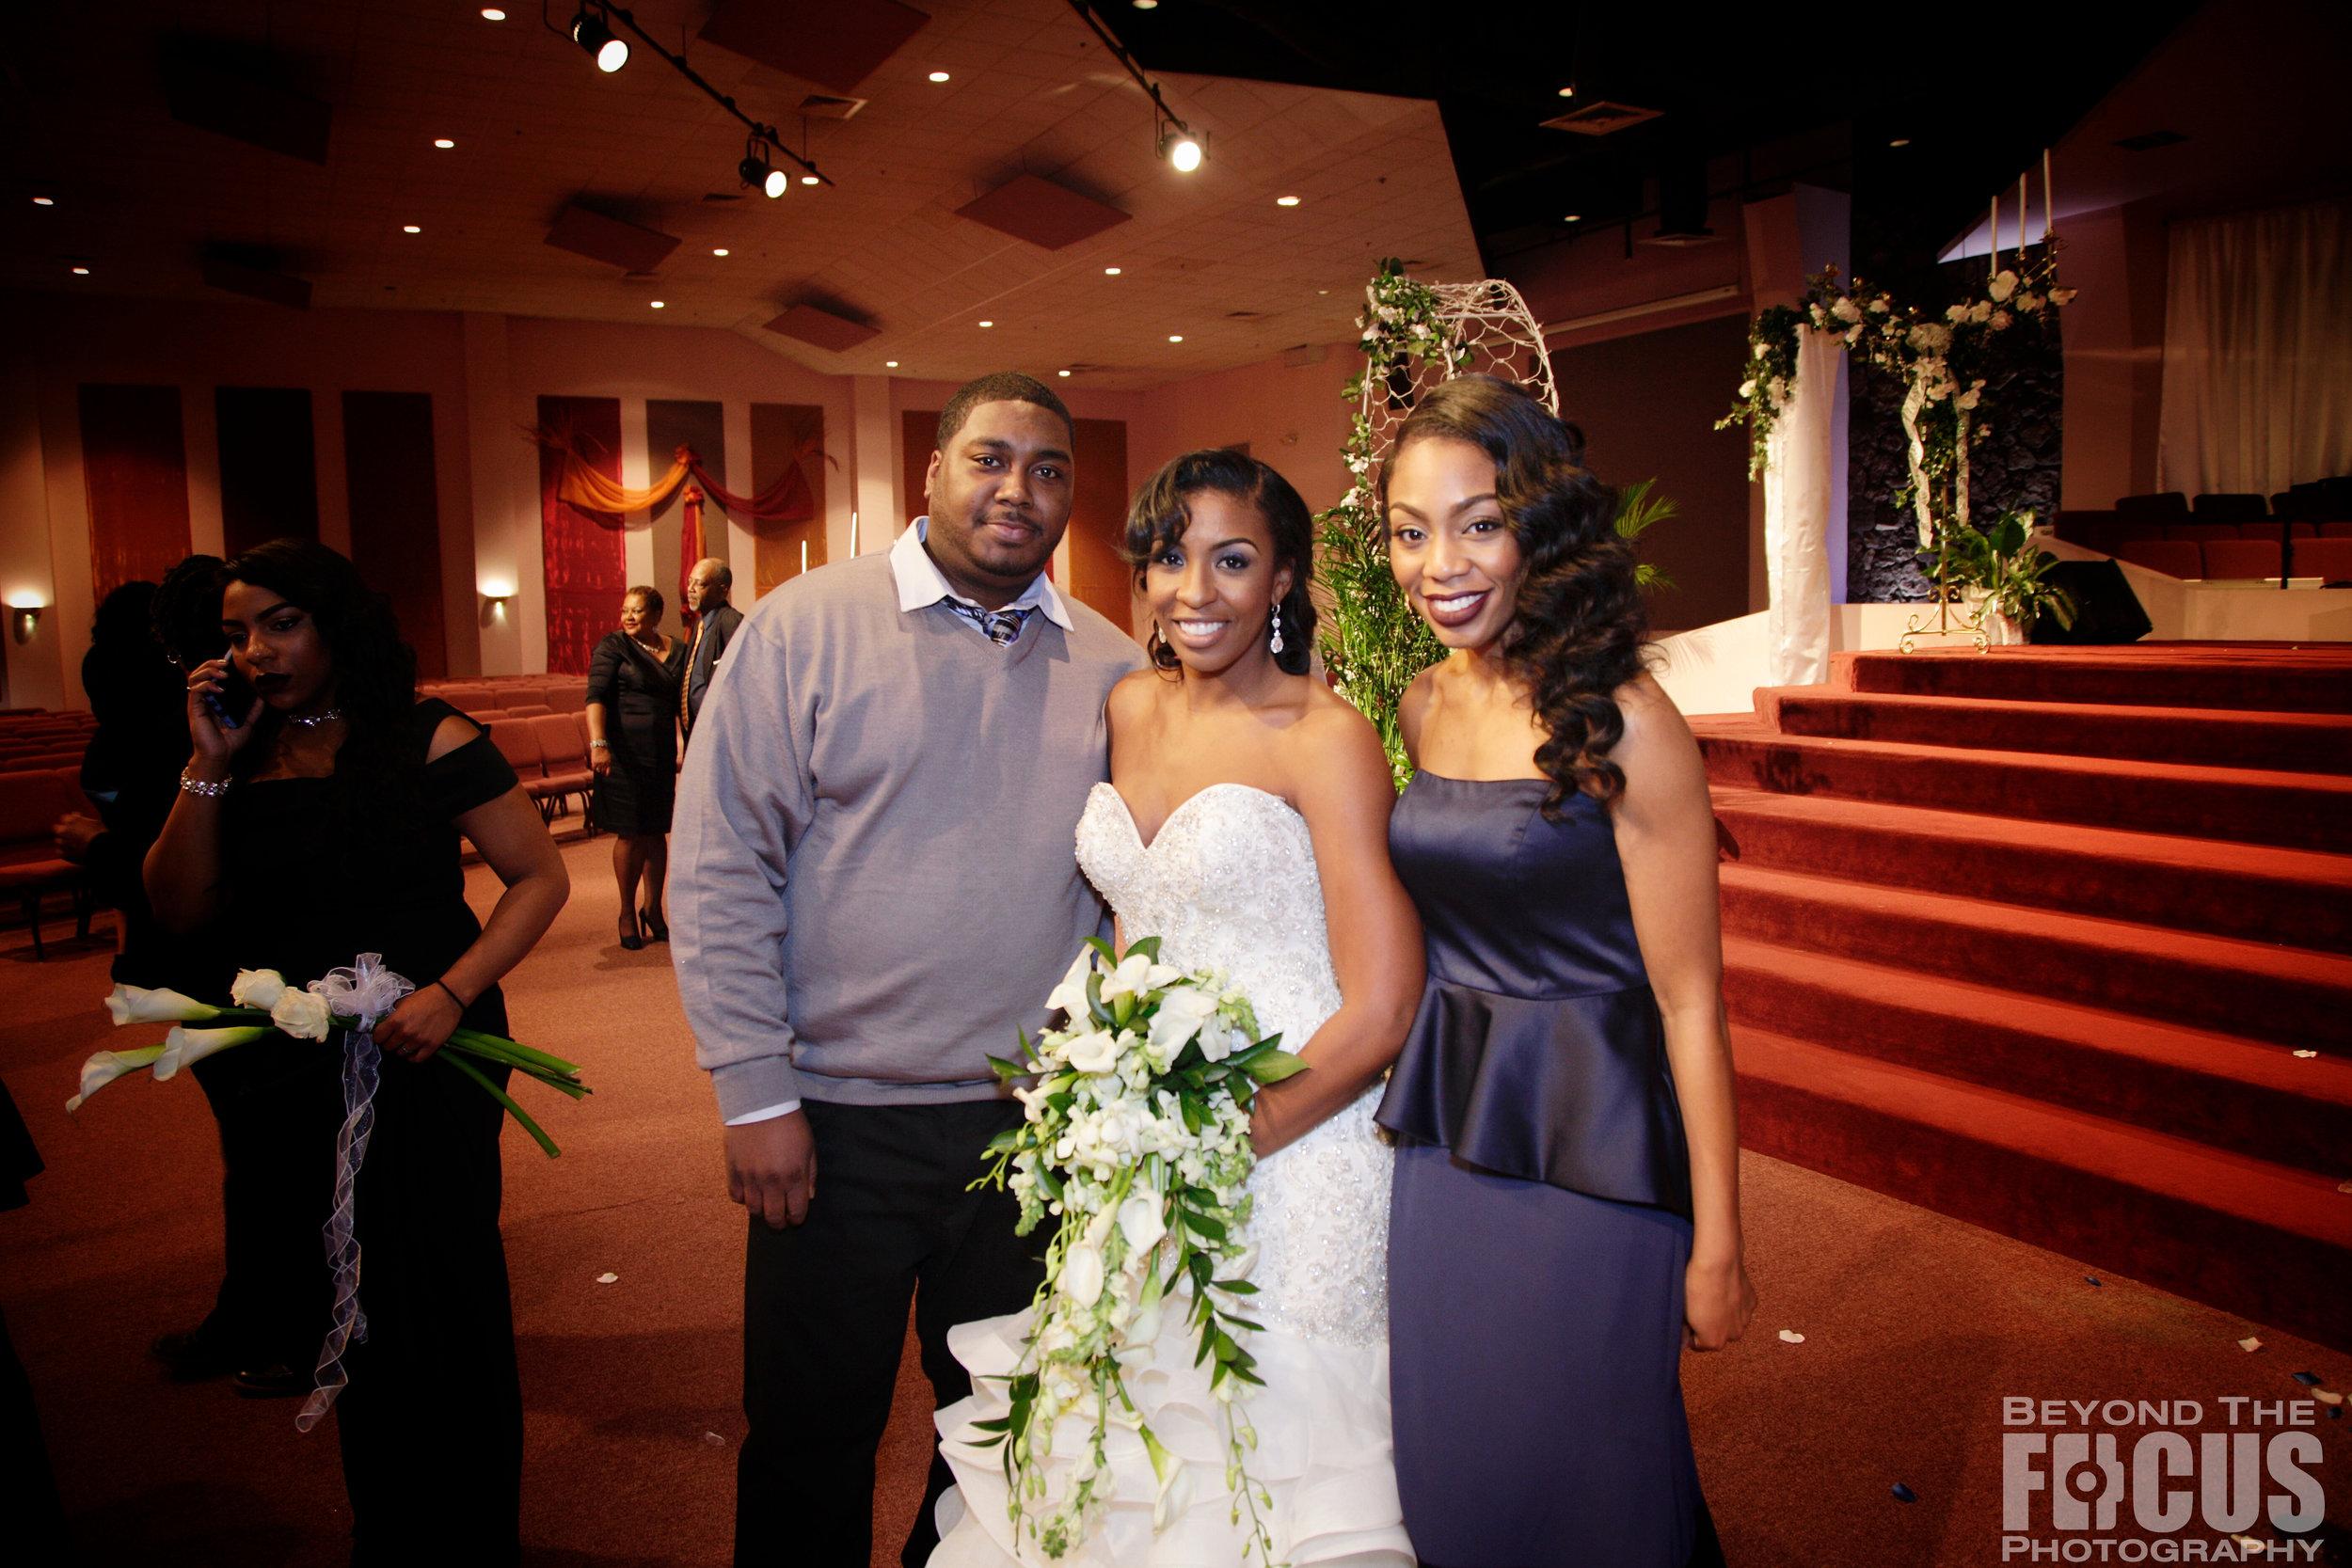 Matthews_Wedding_Ceremony_151.jpg